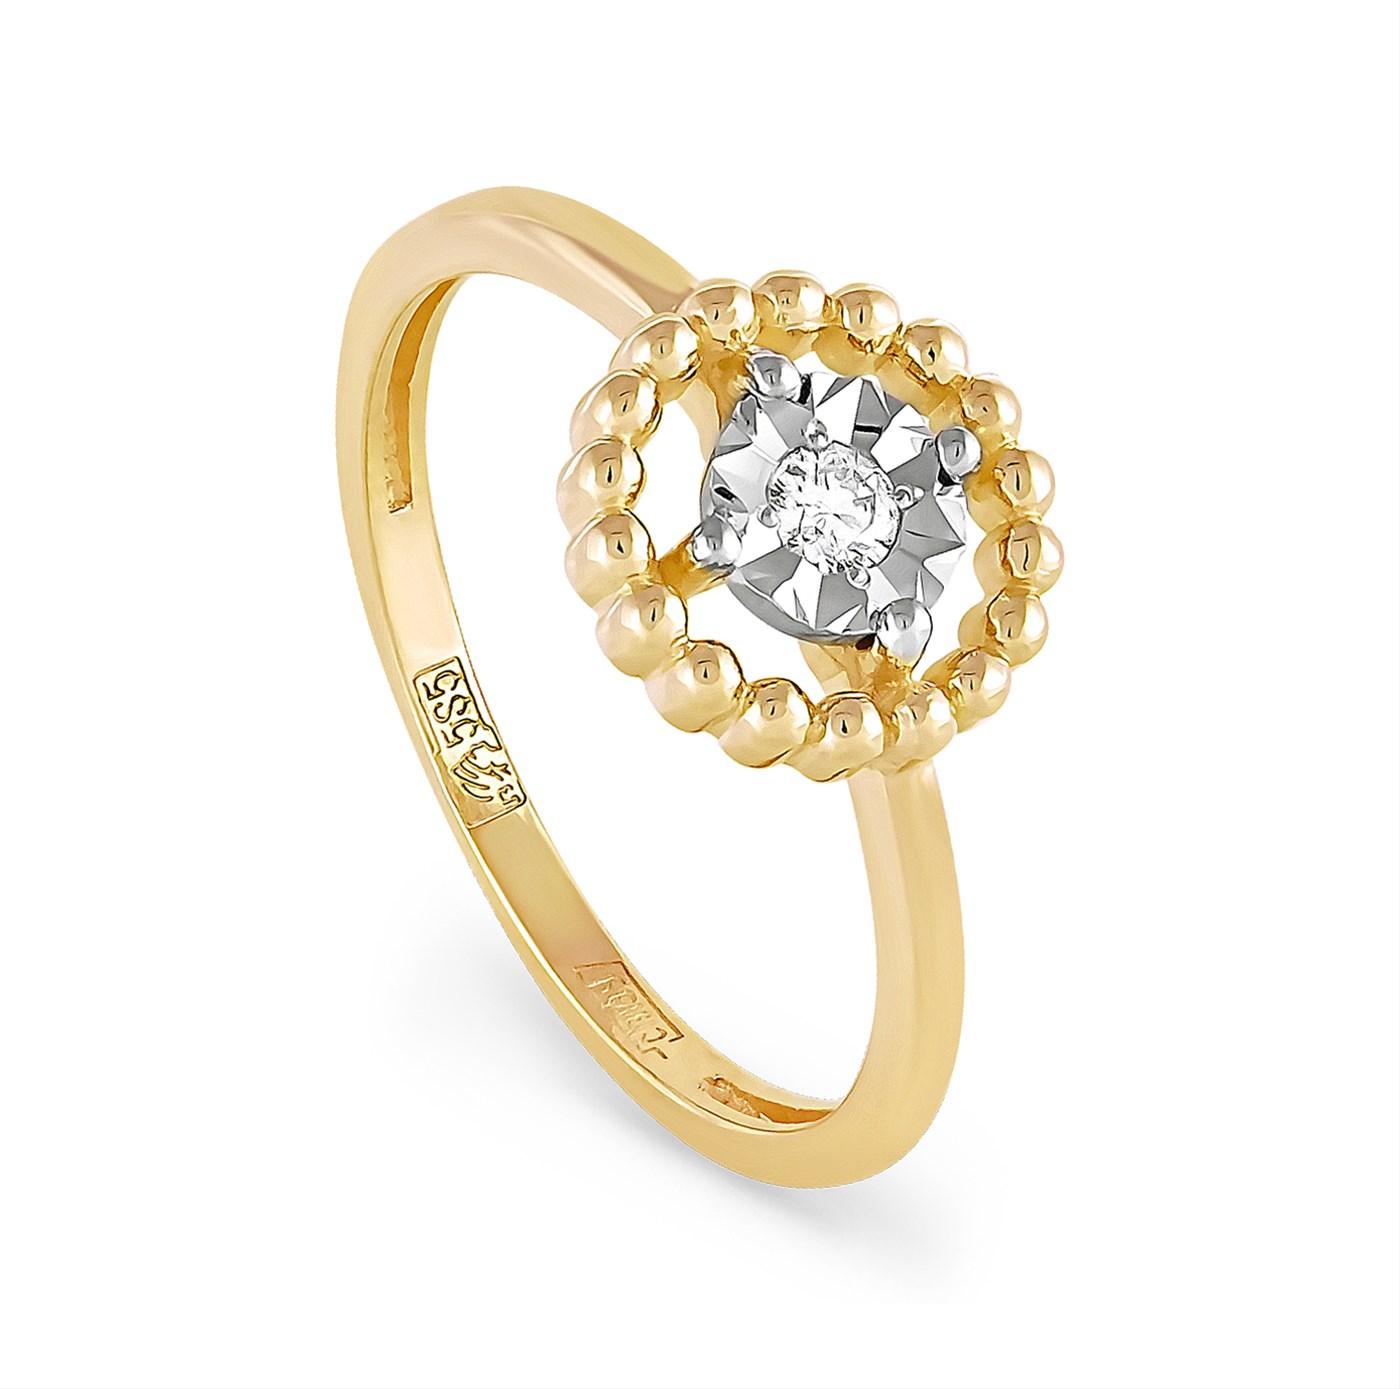 Кольцо из лимонного золота Бриллиант арт. 11-2903-1000 11-2903-1000